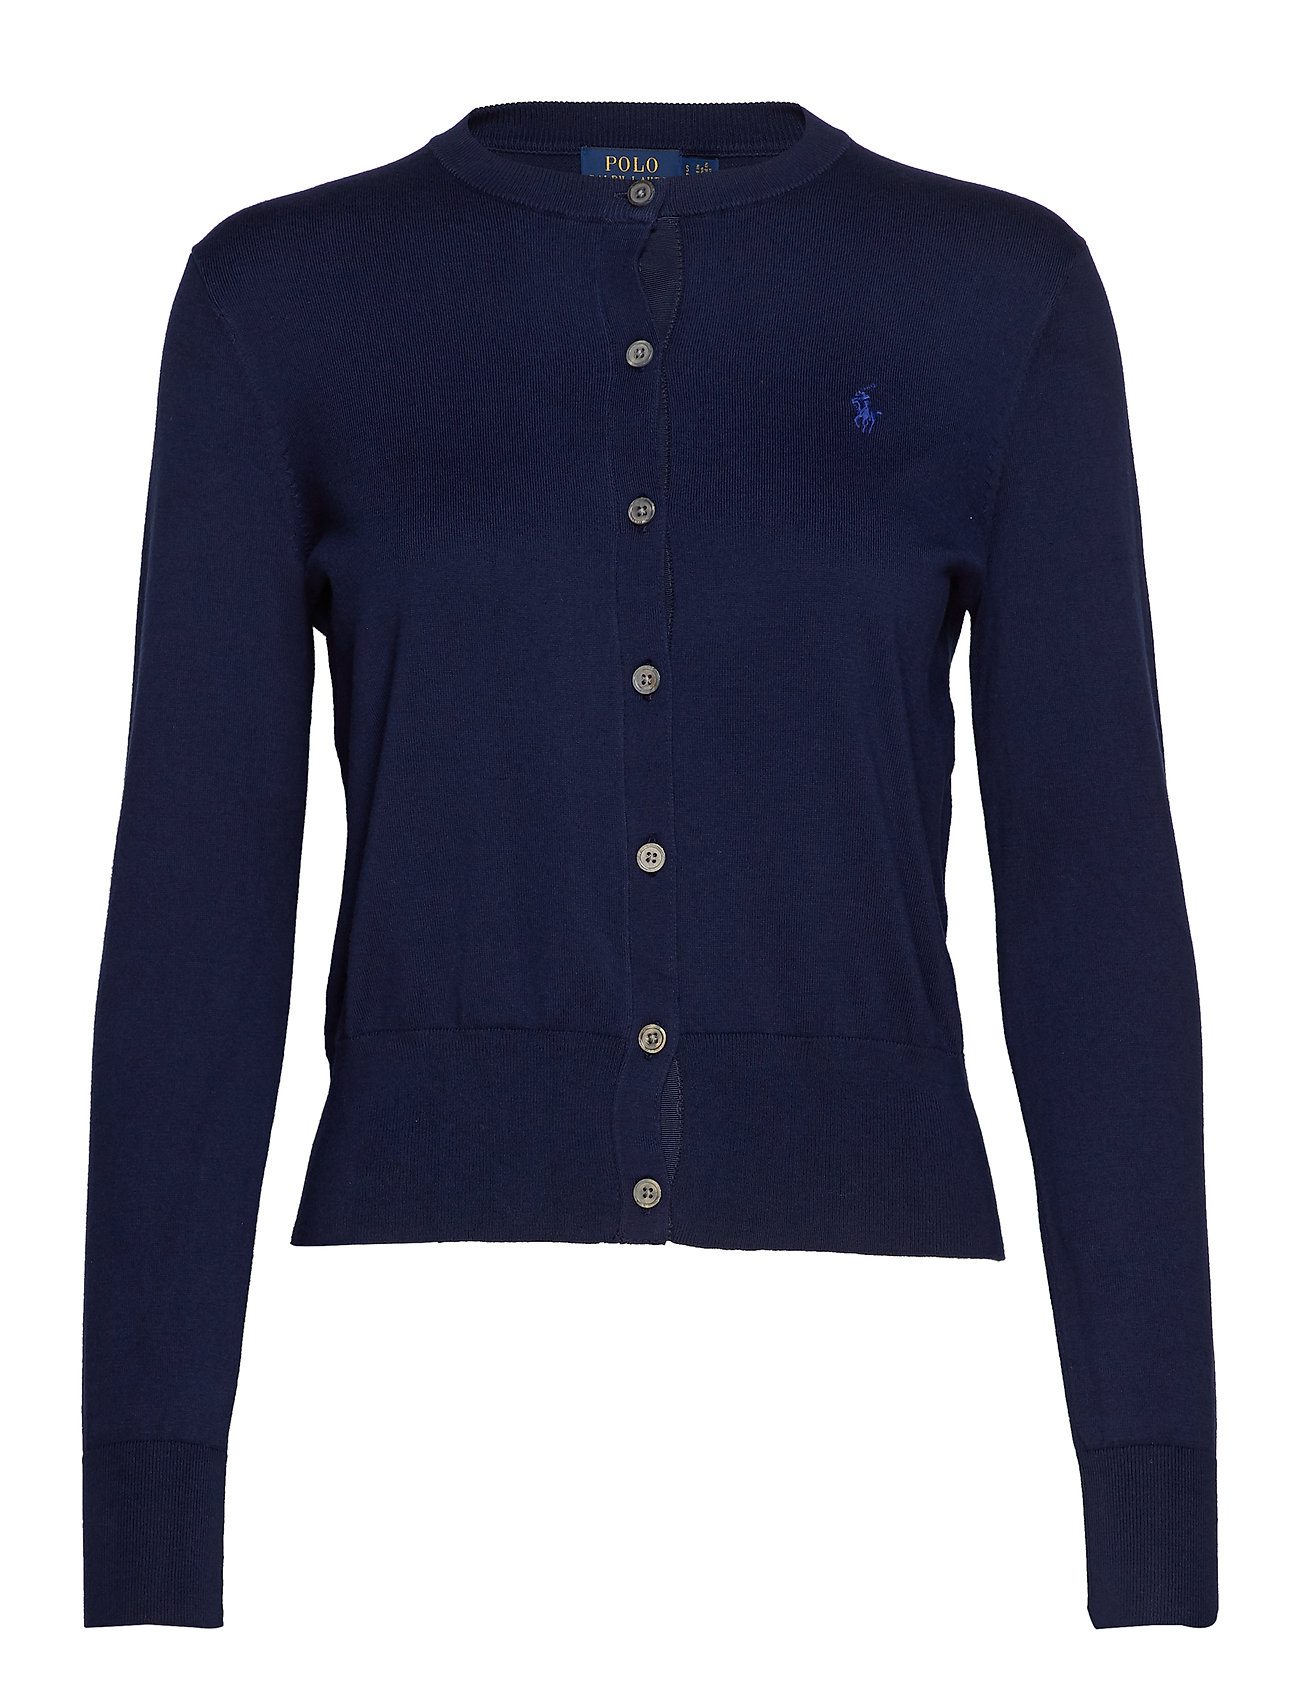 Polo Ralph Lauren Cotton Cardigan Sweater - BRIGHT NAVY